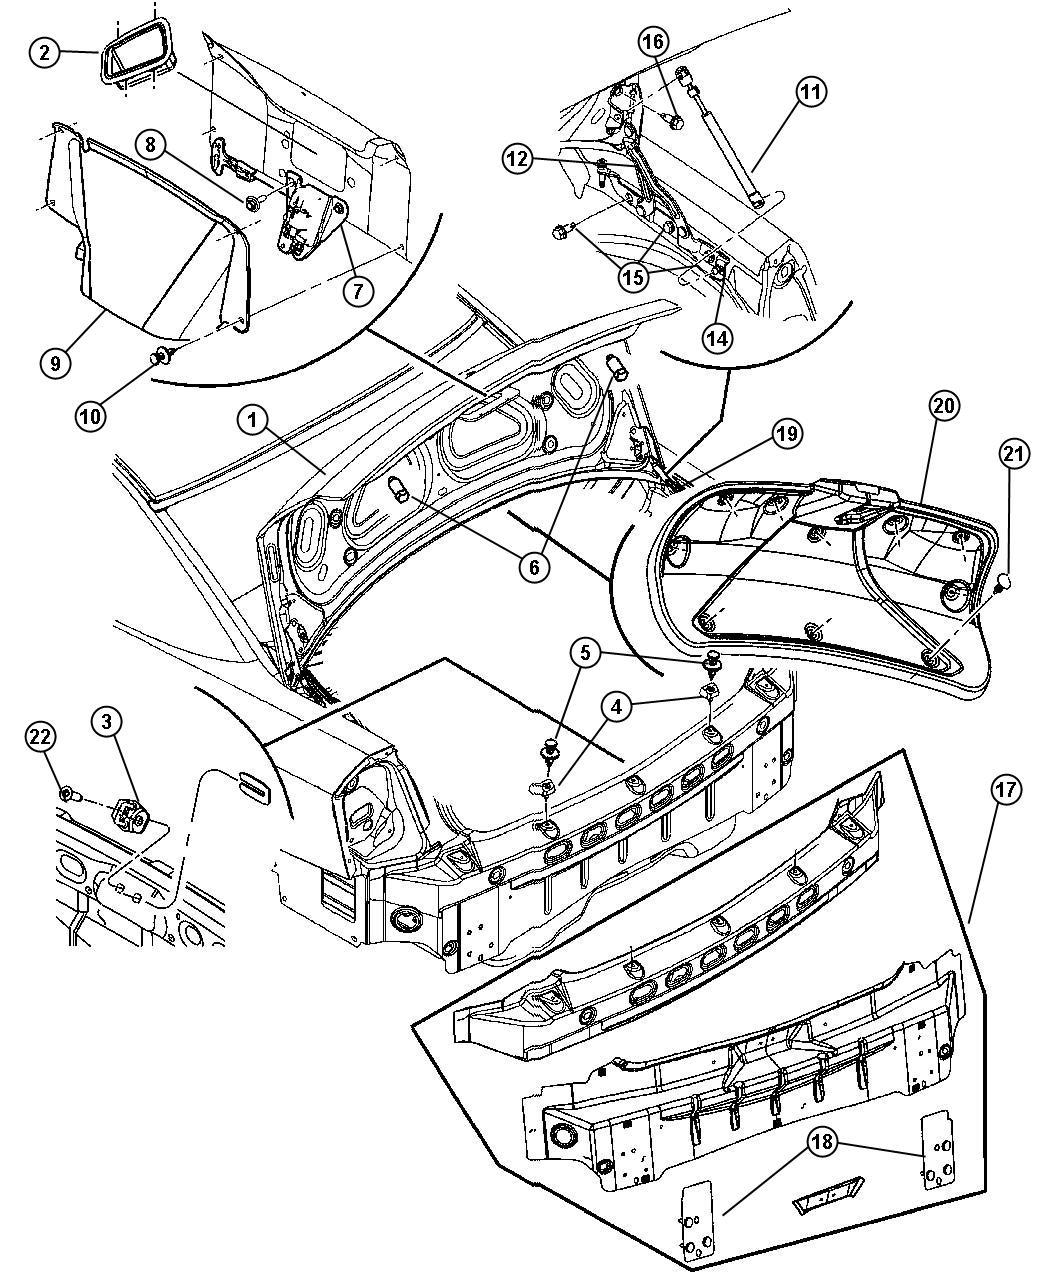 Chrysler 300 Rod. Lid, deck, related, mopar, body